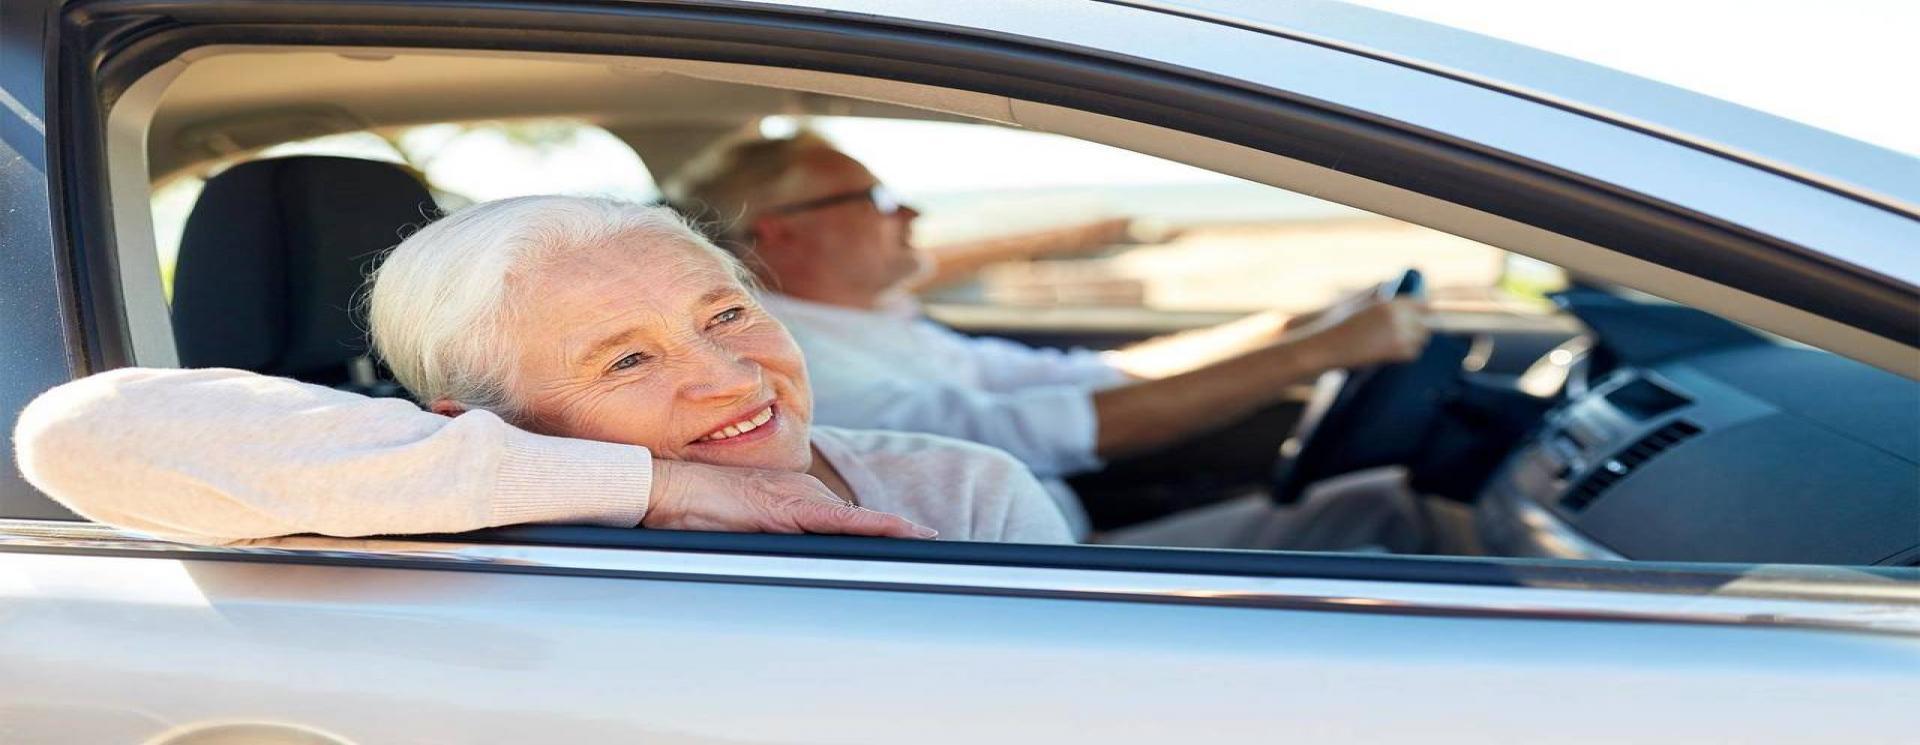 Senior persons hiring a car